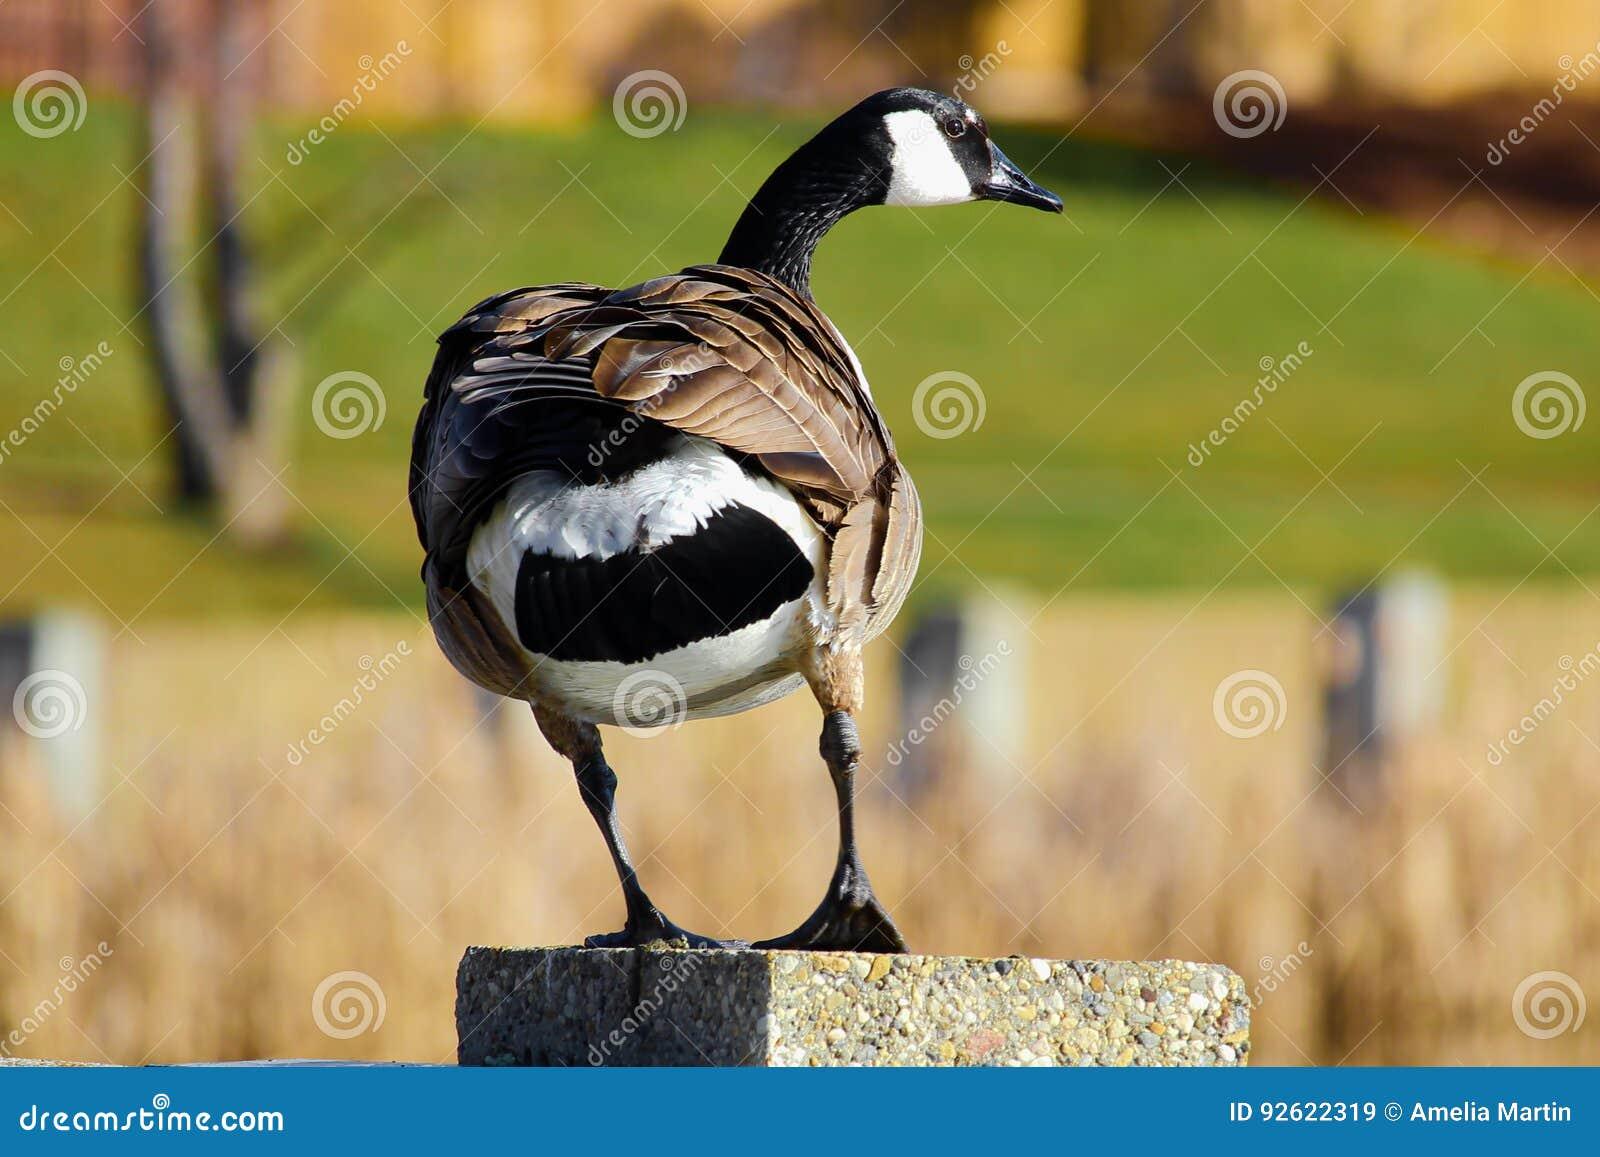 Goose Hunting Pics Cartoon